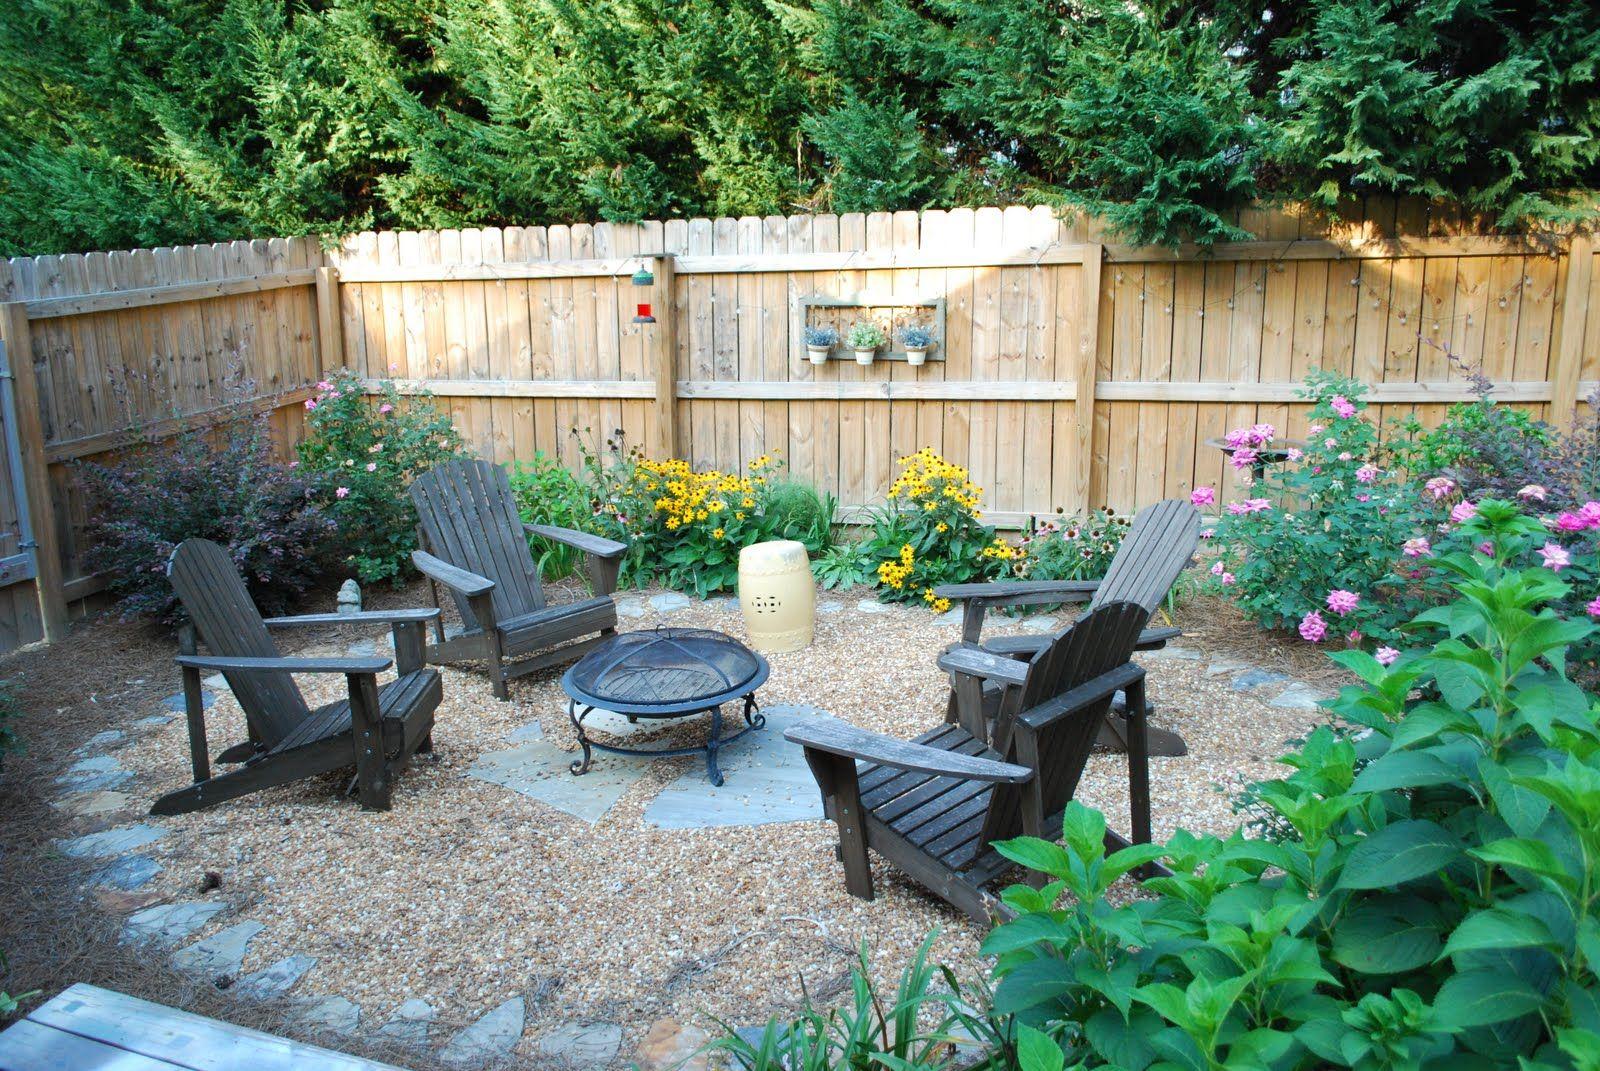 Small Backyard Landscaping Backyard Fire Backyard Fences Mini backyard fire pit